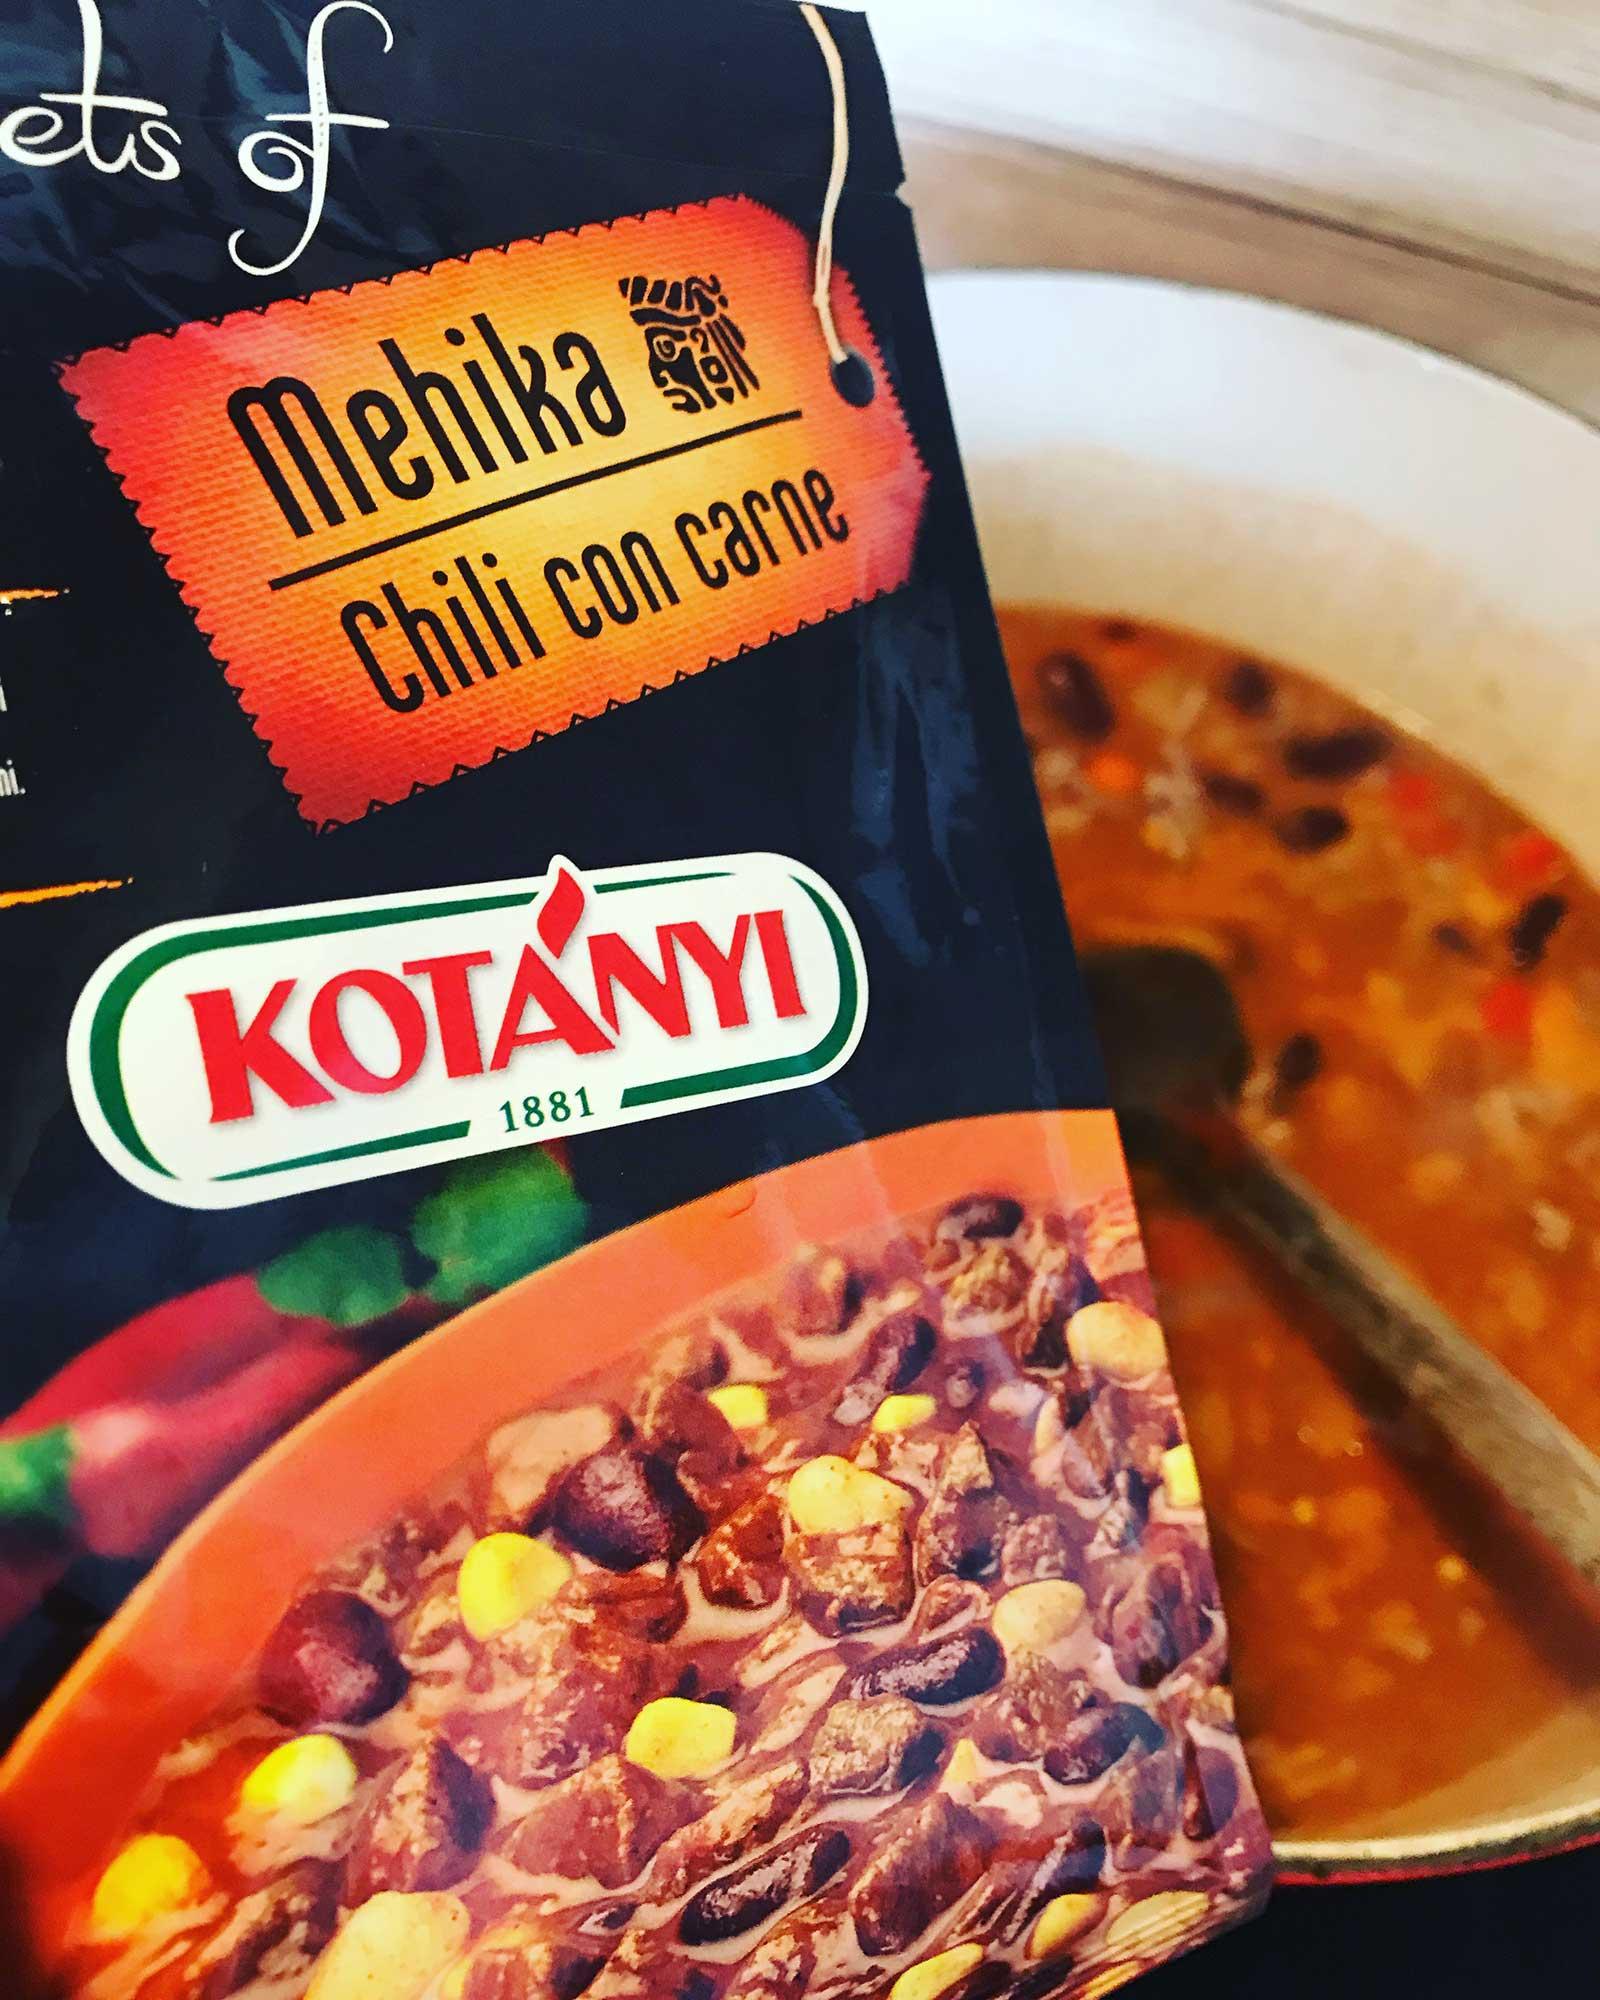 Chili con carne Kotanyi